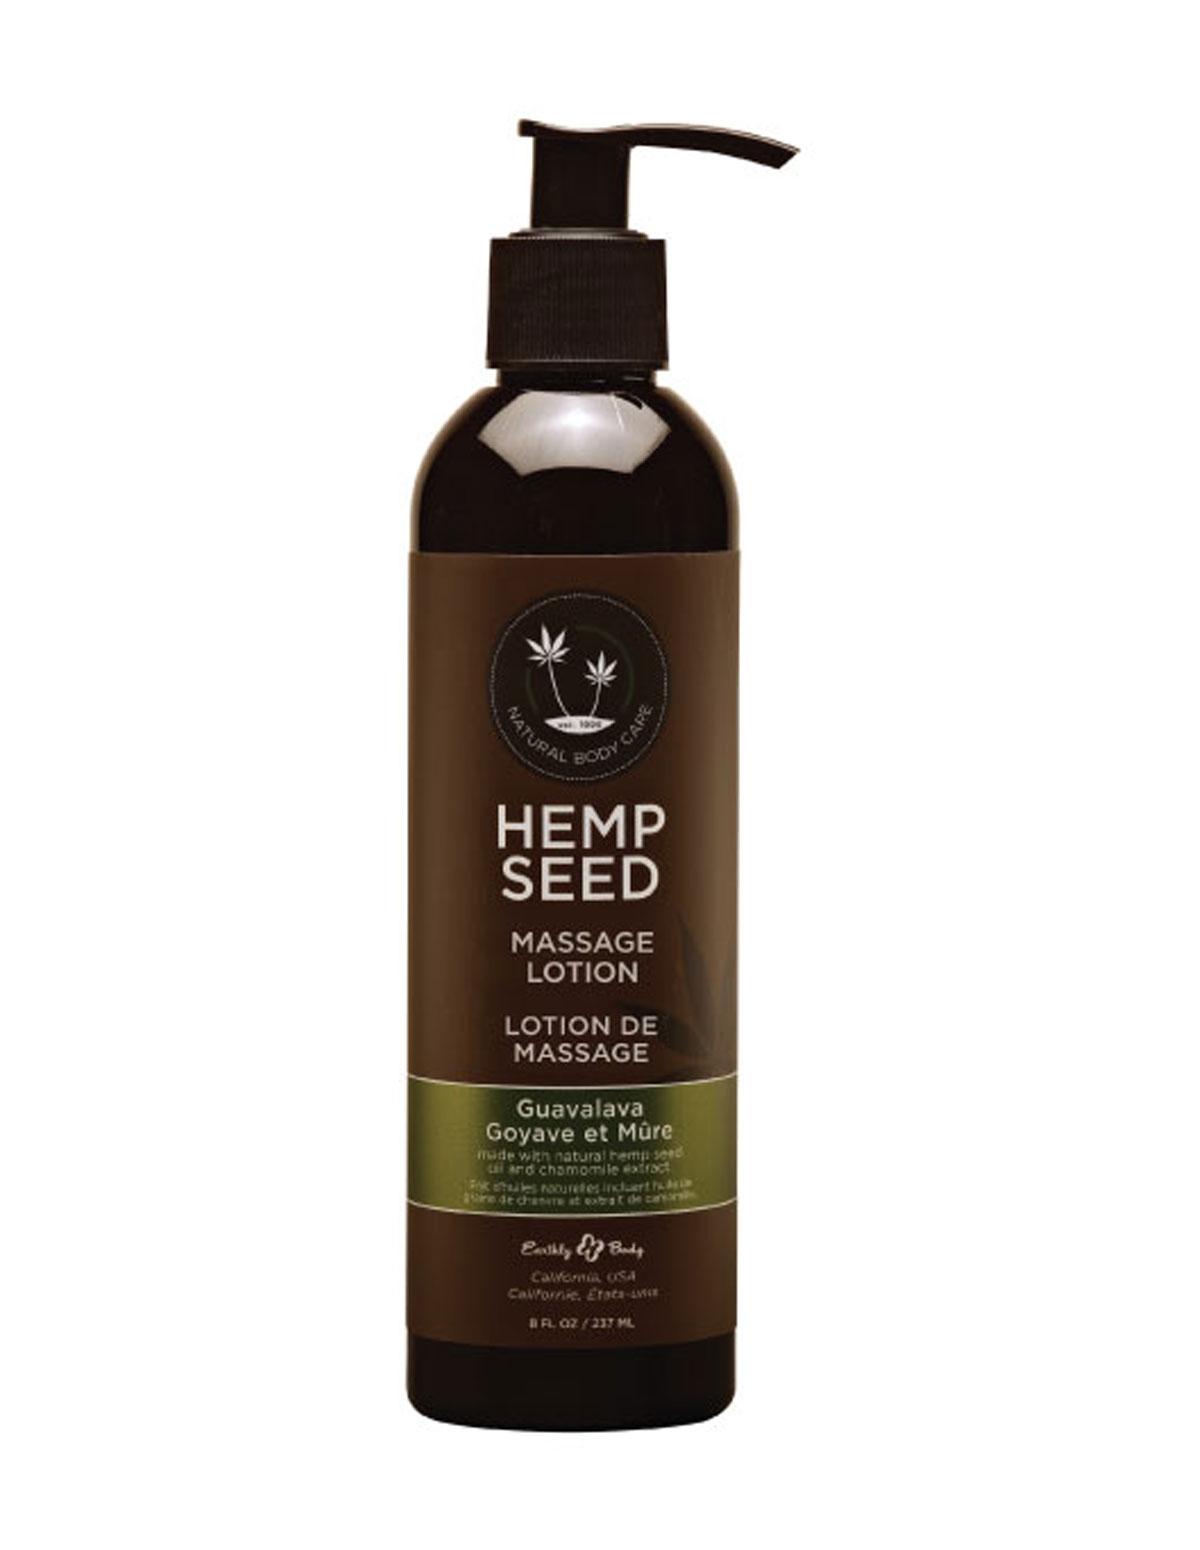 Hemp Seed Massage Lotion - Guavalava